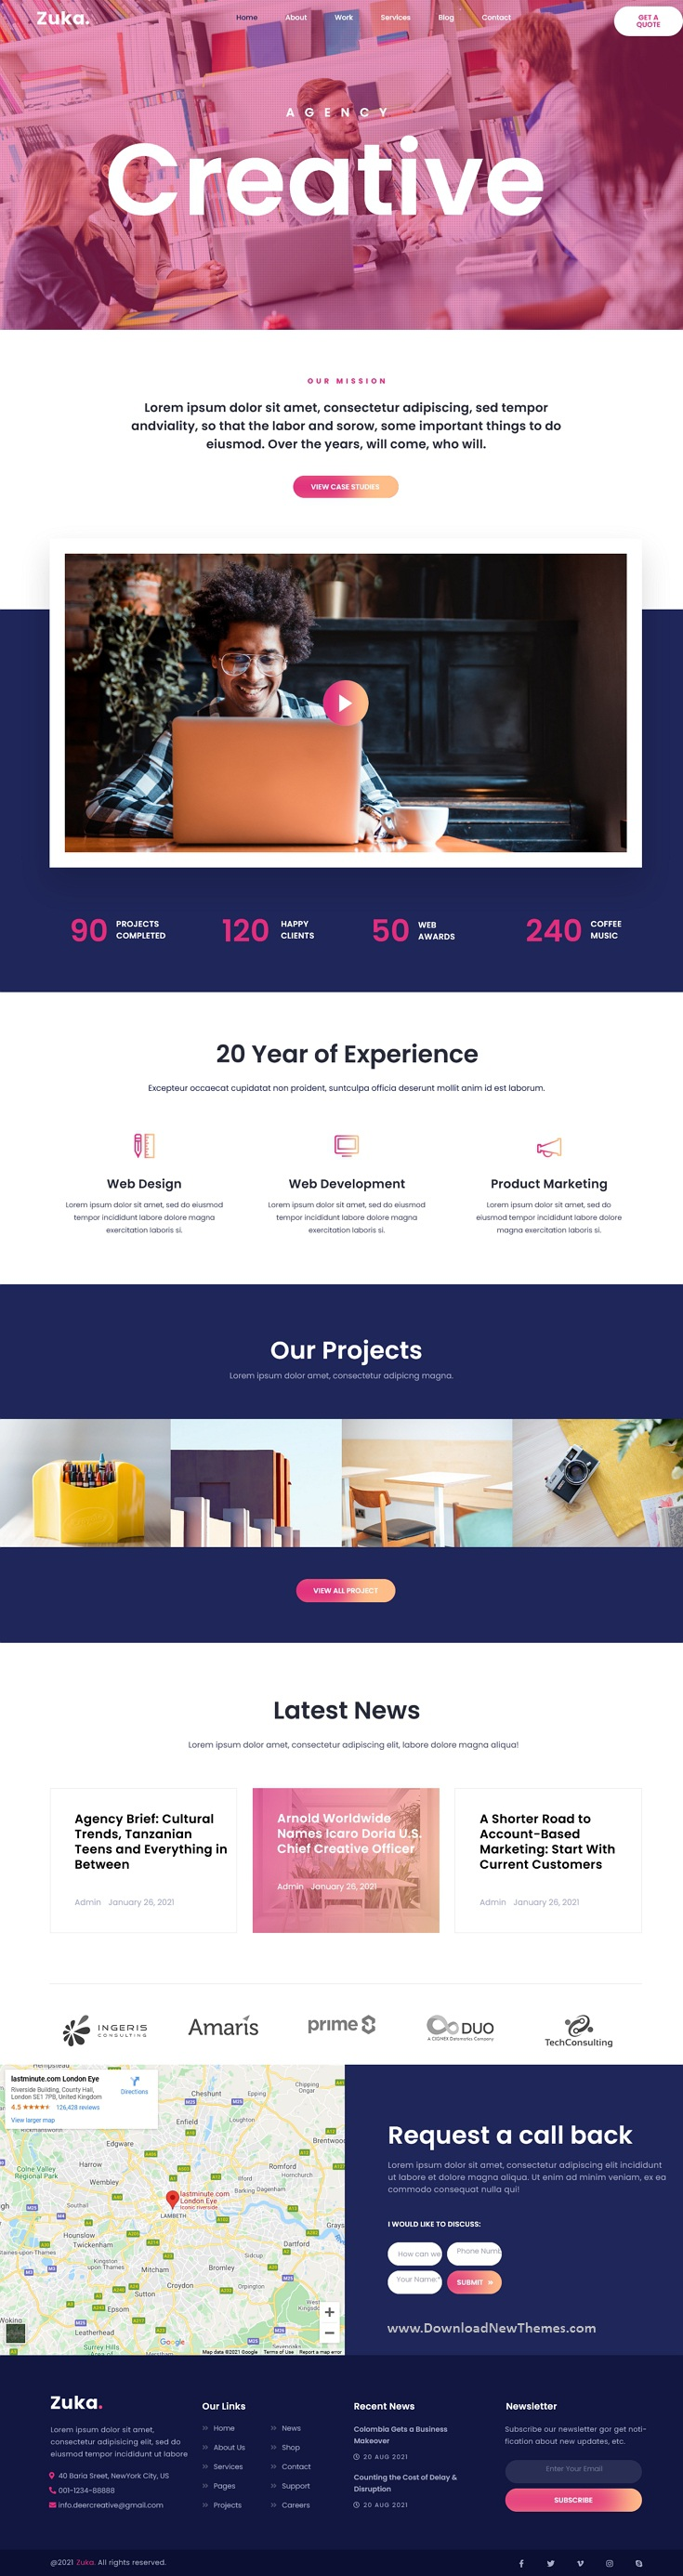 Creative Portfolio and Agency Template Kit